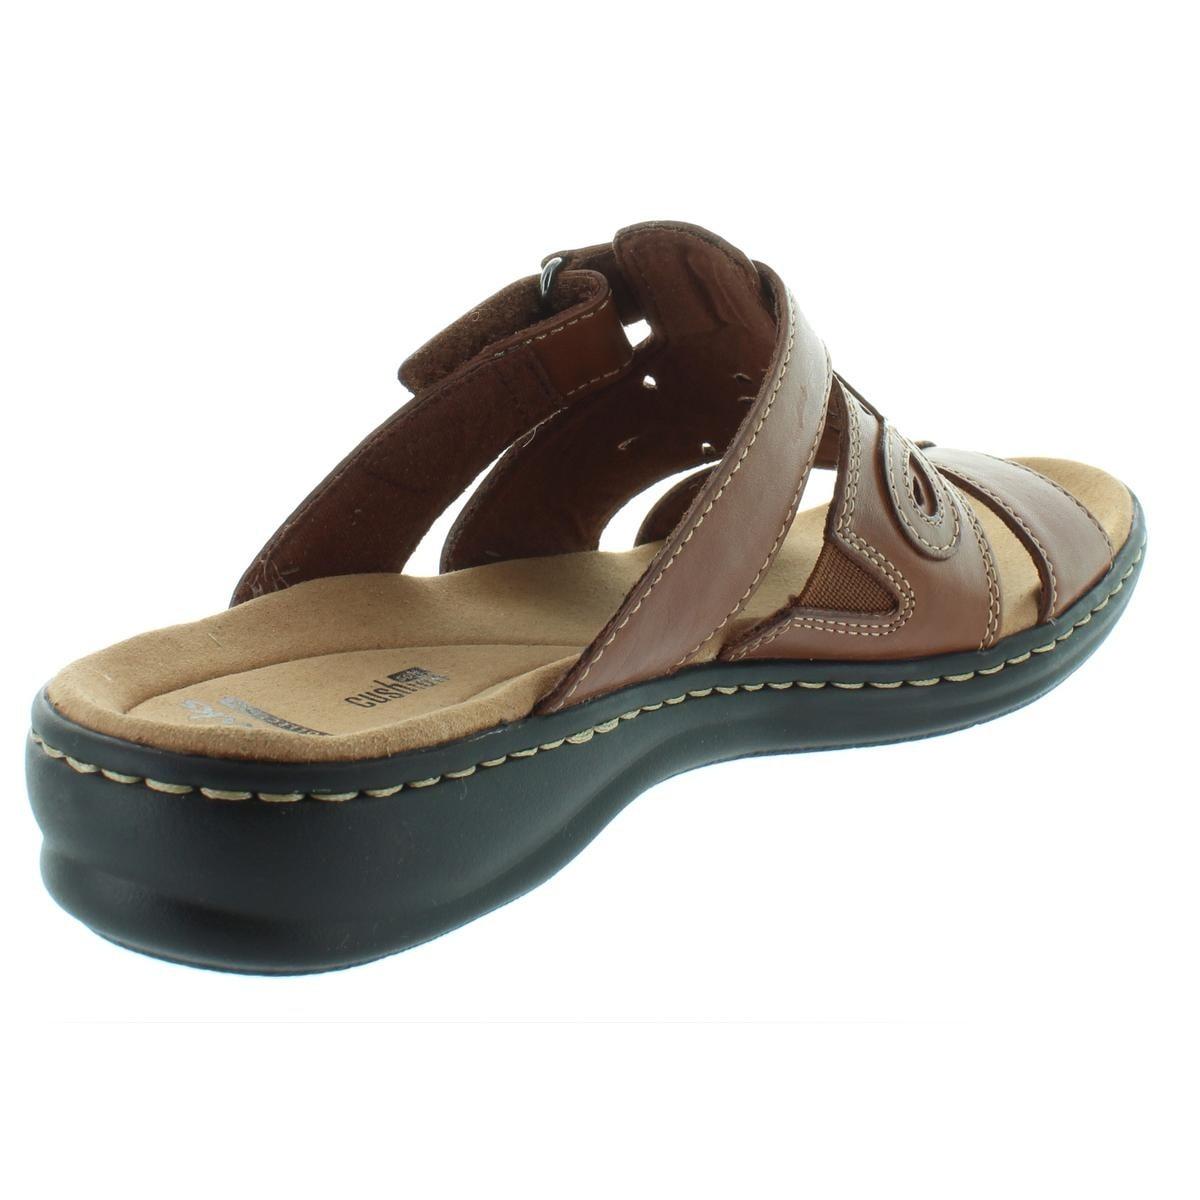 2e3f8f452a09 Shop Clarks Womens Leisa Higley Slide Sandals Leather Open Toe - 10 medium  (b